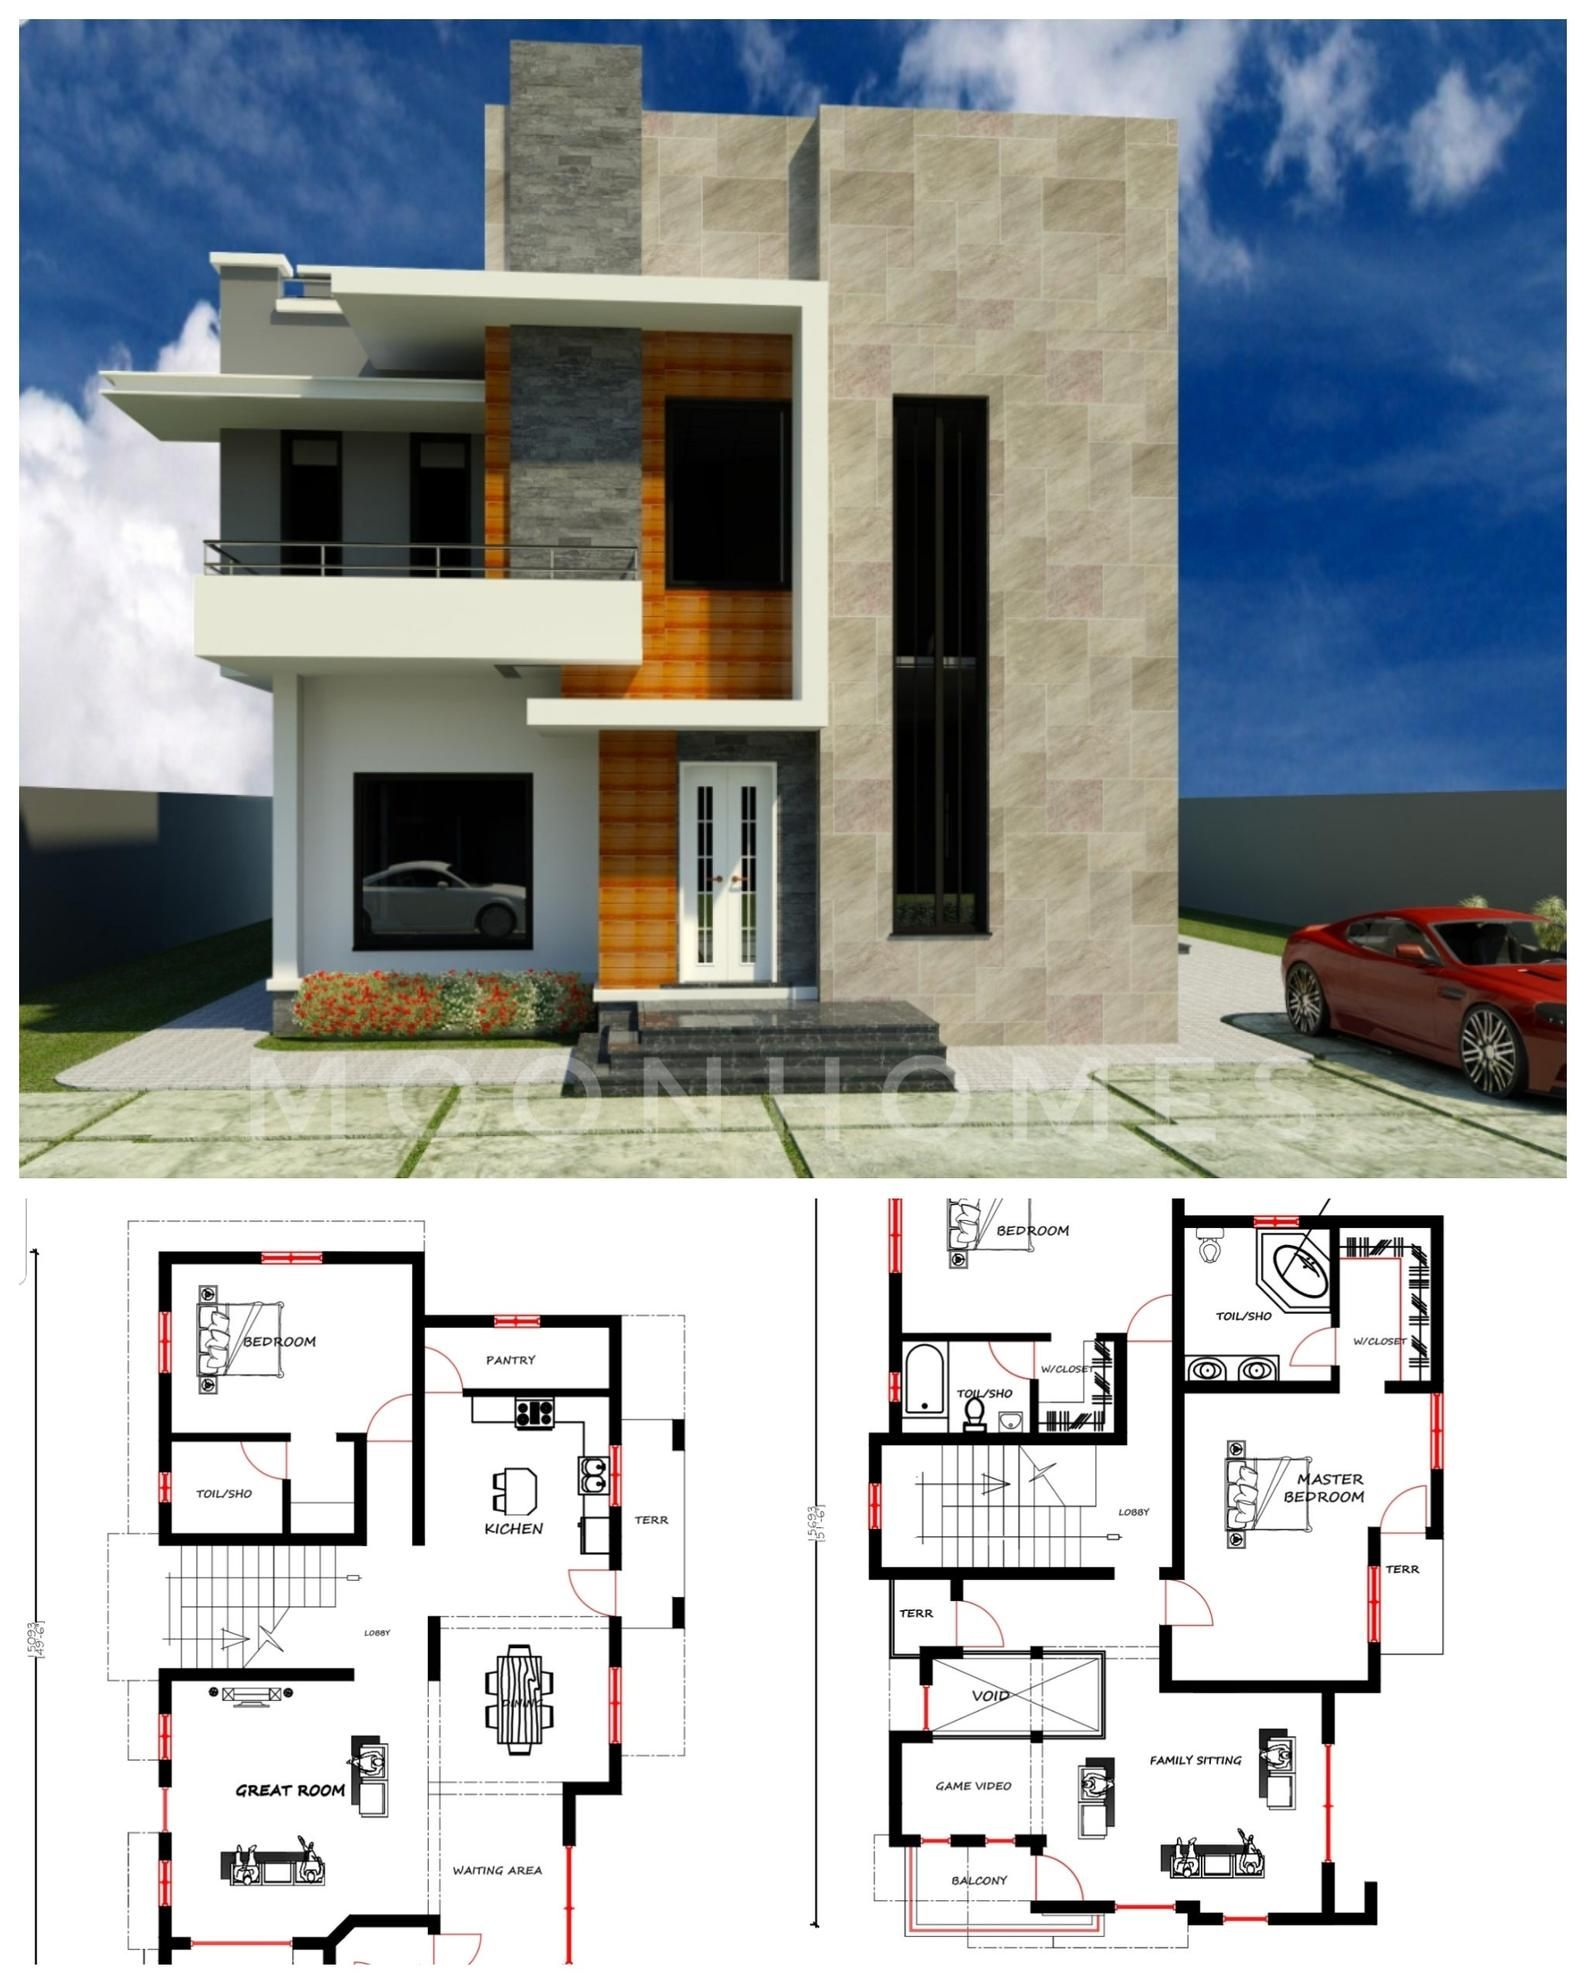 3 Bedroom Duplex House Plan Modern Home Design House Floor Plans Tv Shows Floor Plan Duplex House Plans Duplex House Design Beautiful House Plans